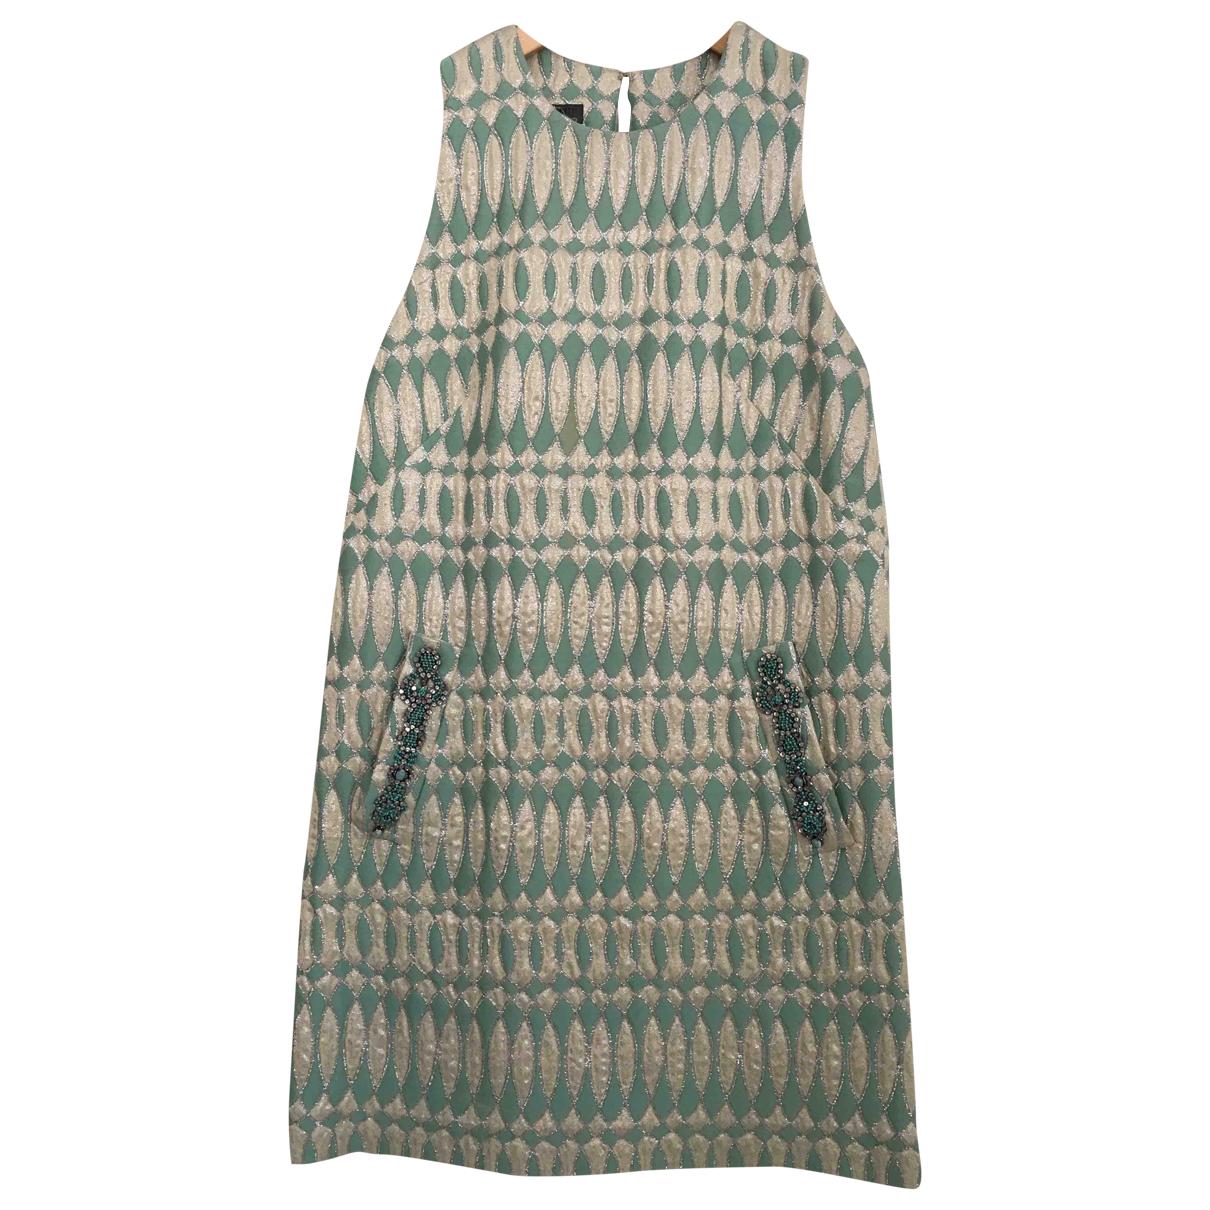 Alberta Ferretti \N Turquoise Cotton dress for Women 38 IT